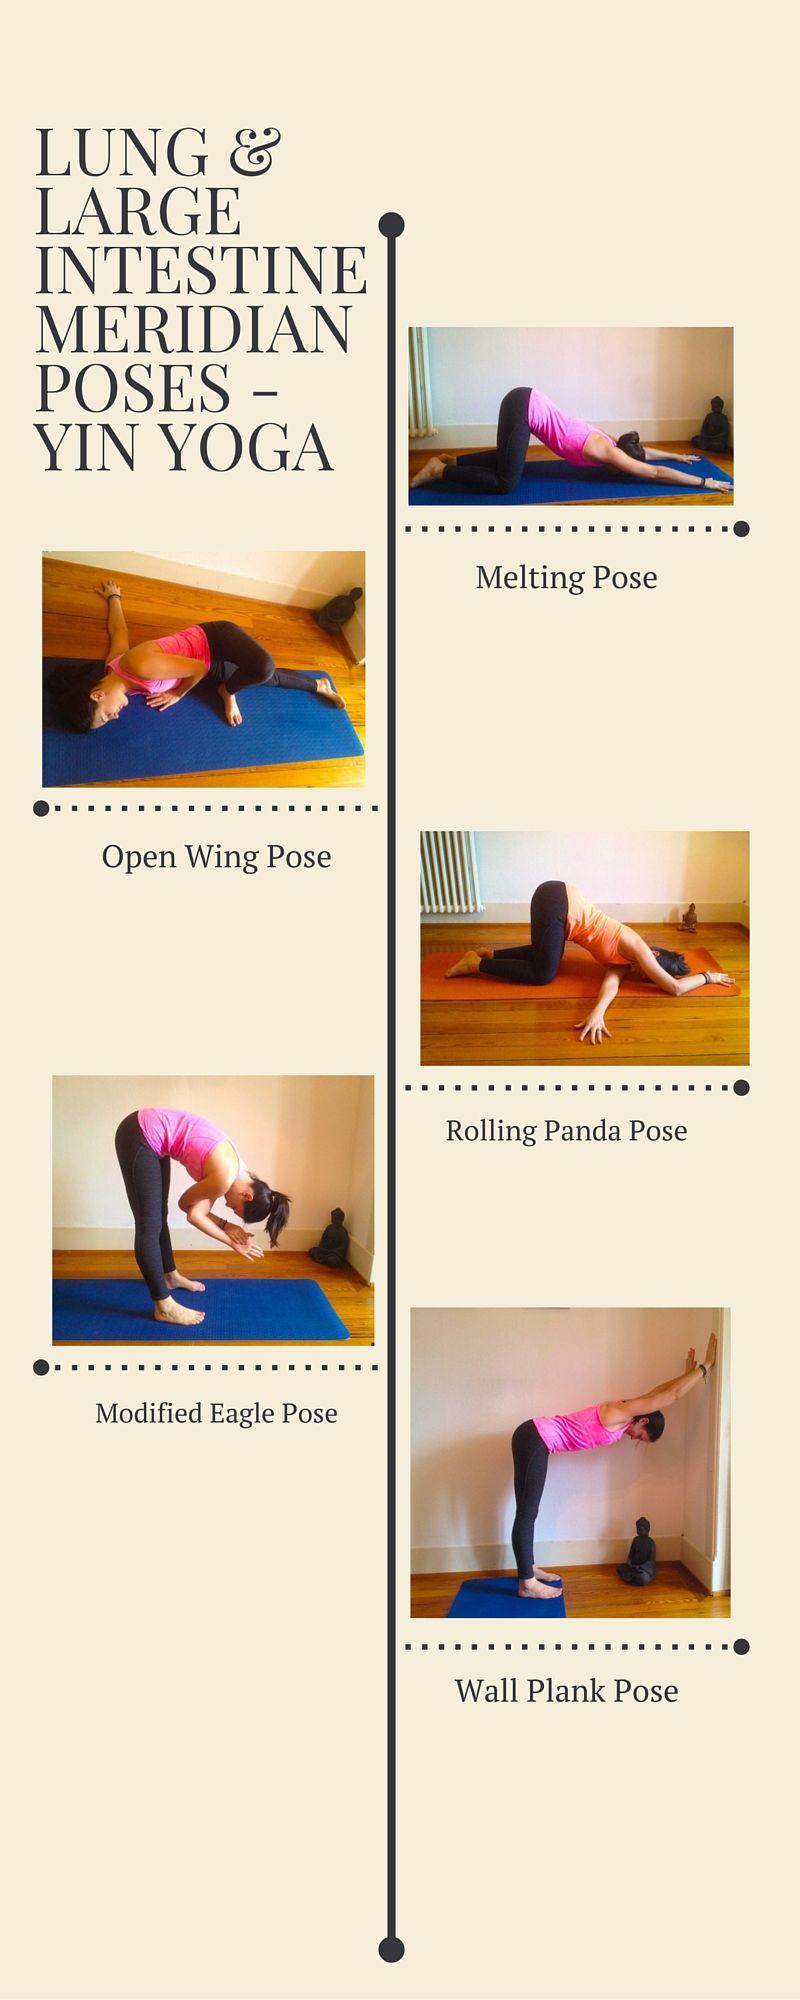 Yin Yoga Large Intestine Meridian Poses Myoga Studio Lausanne Yin Yoga Poses Yin Yoga Sequence Yin Yoga